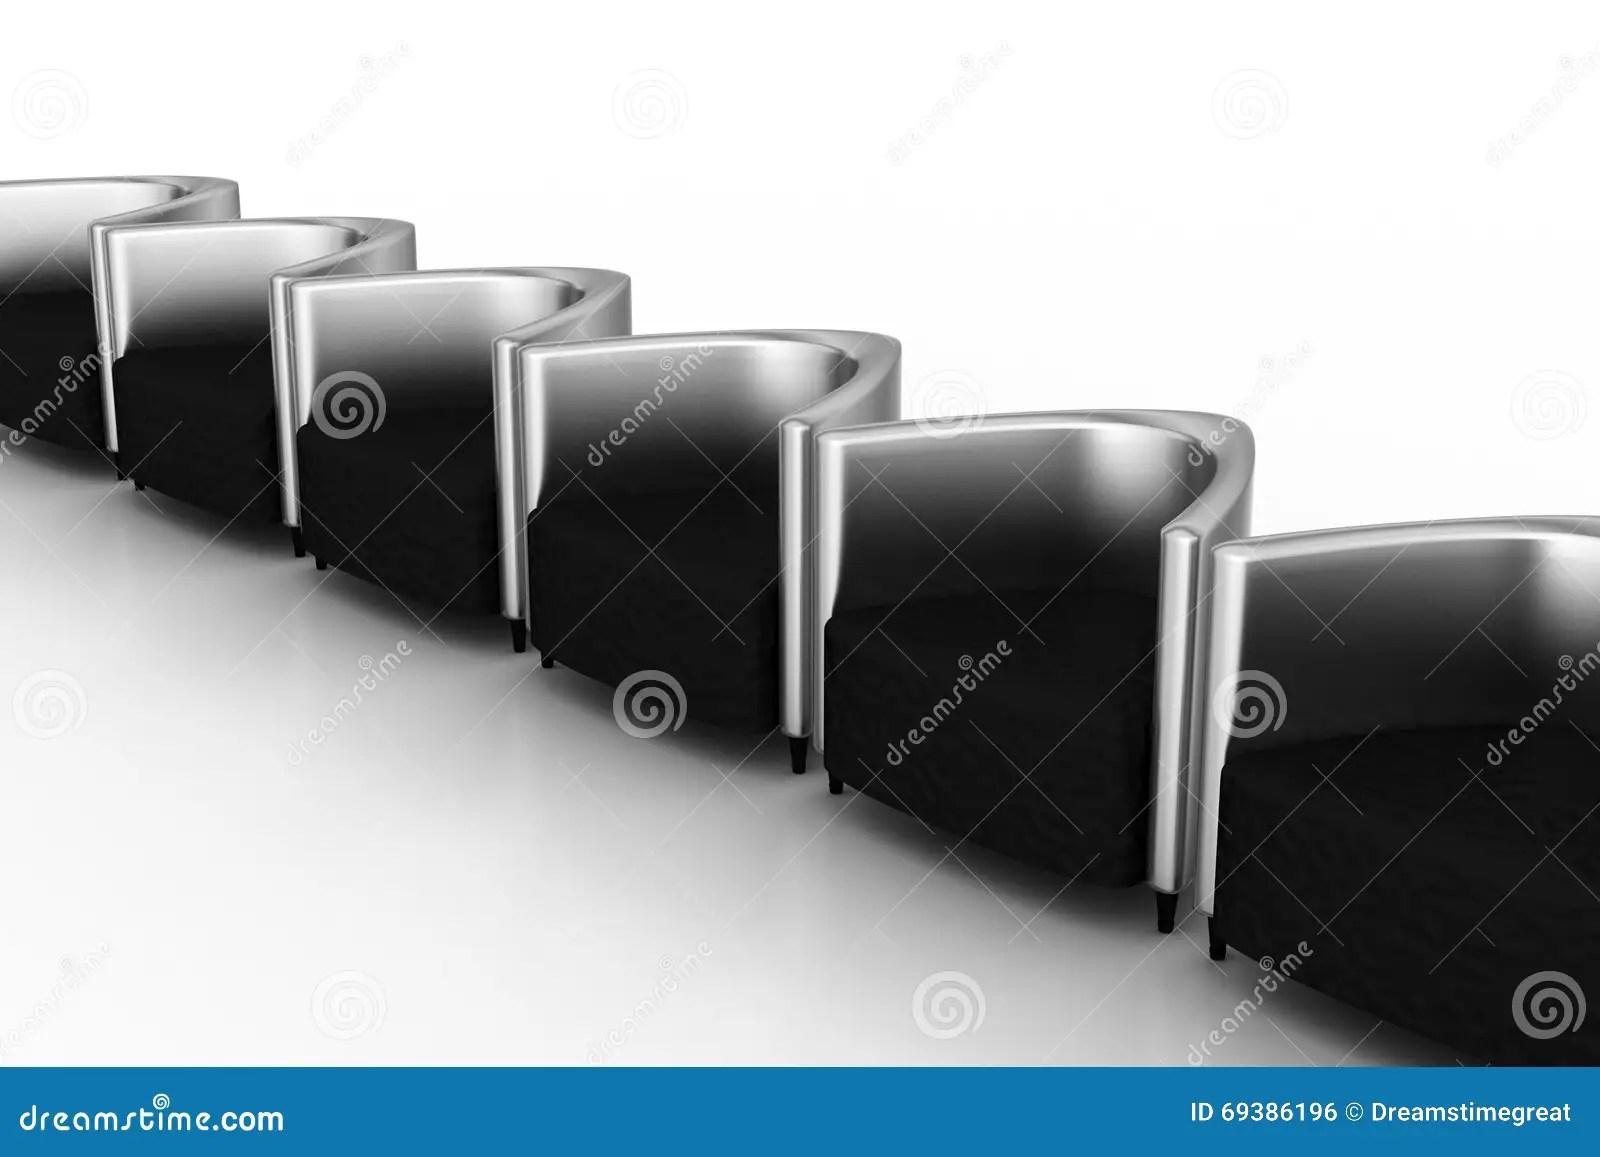 corner bench seating for kitchen hand grinder 3d角落的座位库存例证 插画包括有对象 椅子 唯一 接收 皮革 居住 3d角落的座位